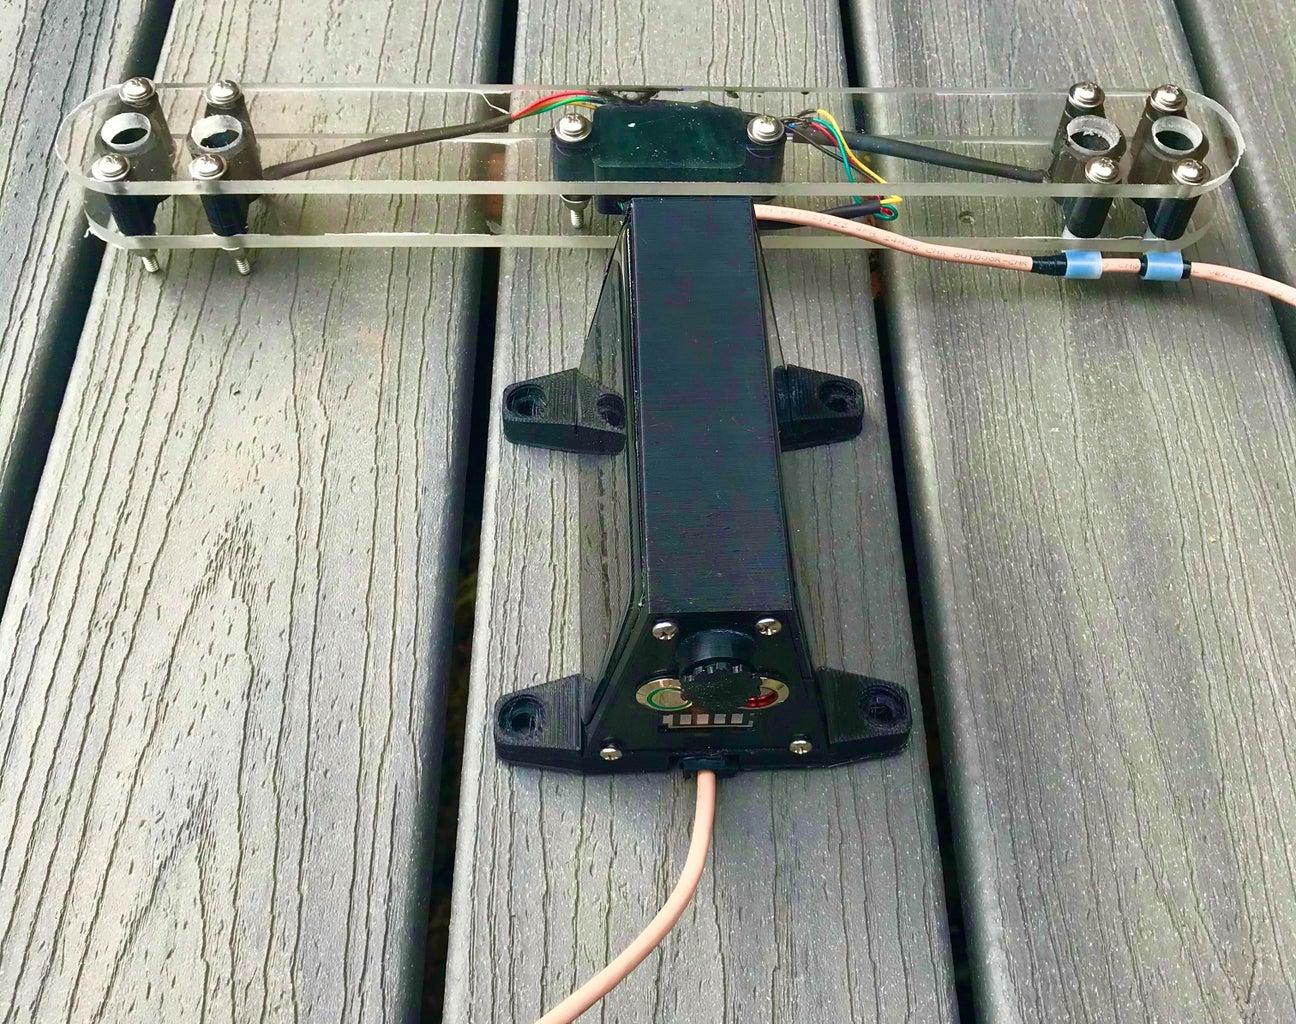 WetRuler--Measuring Ocean Height